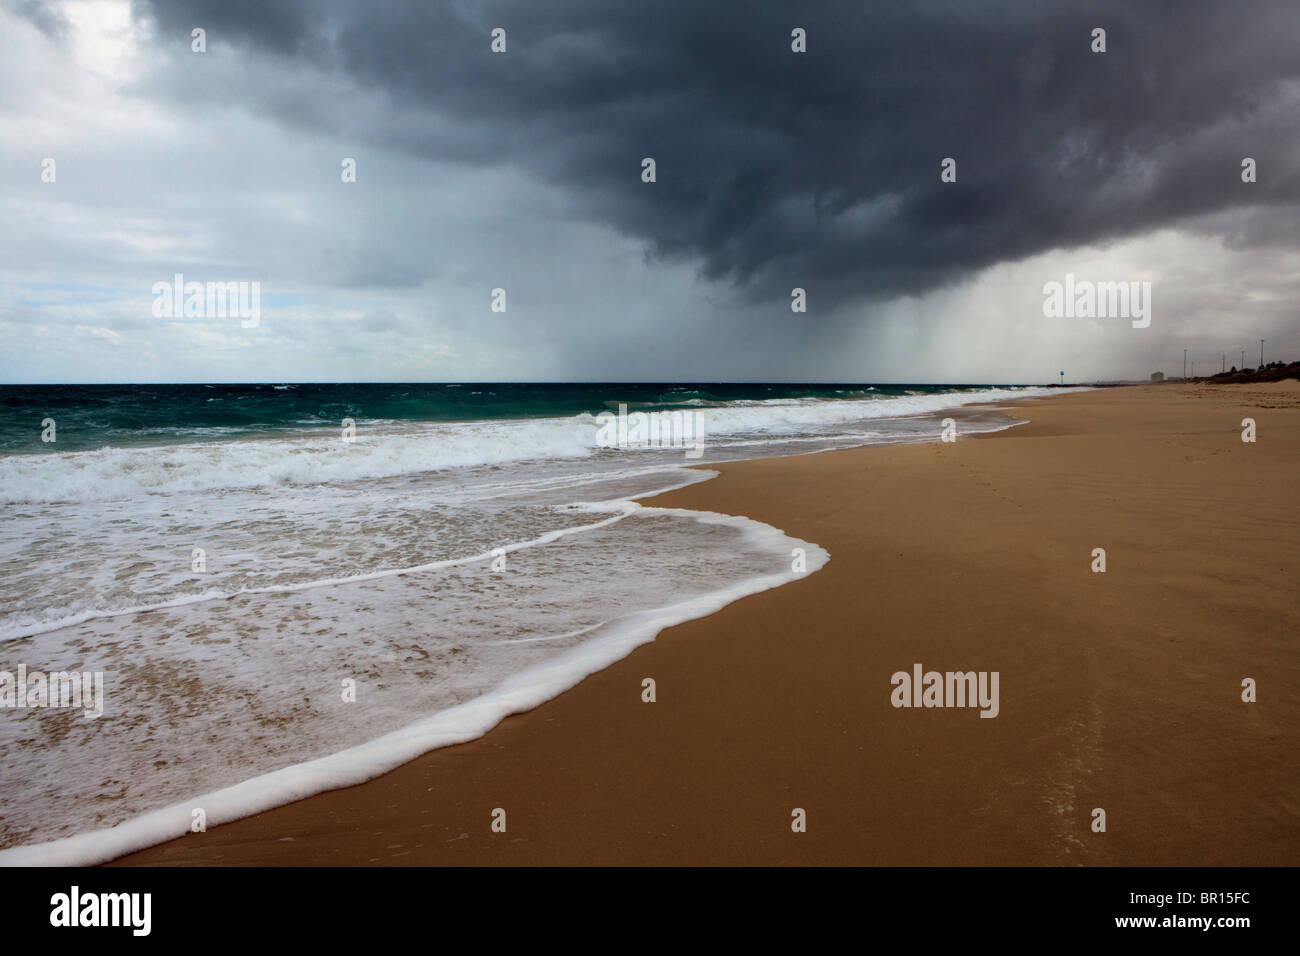 Rain falling at the beach - Stock Image